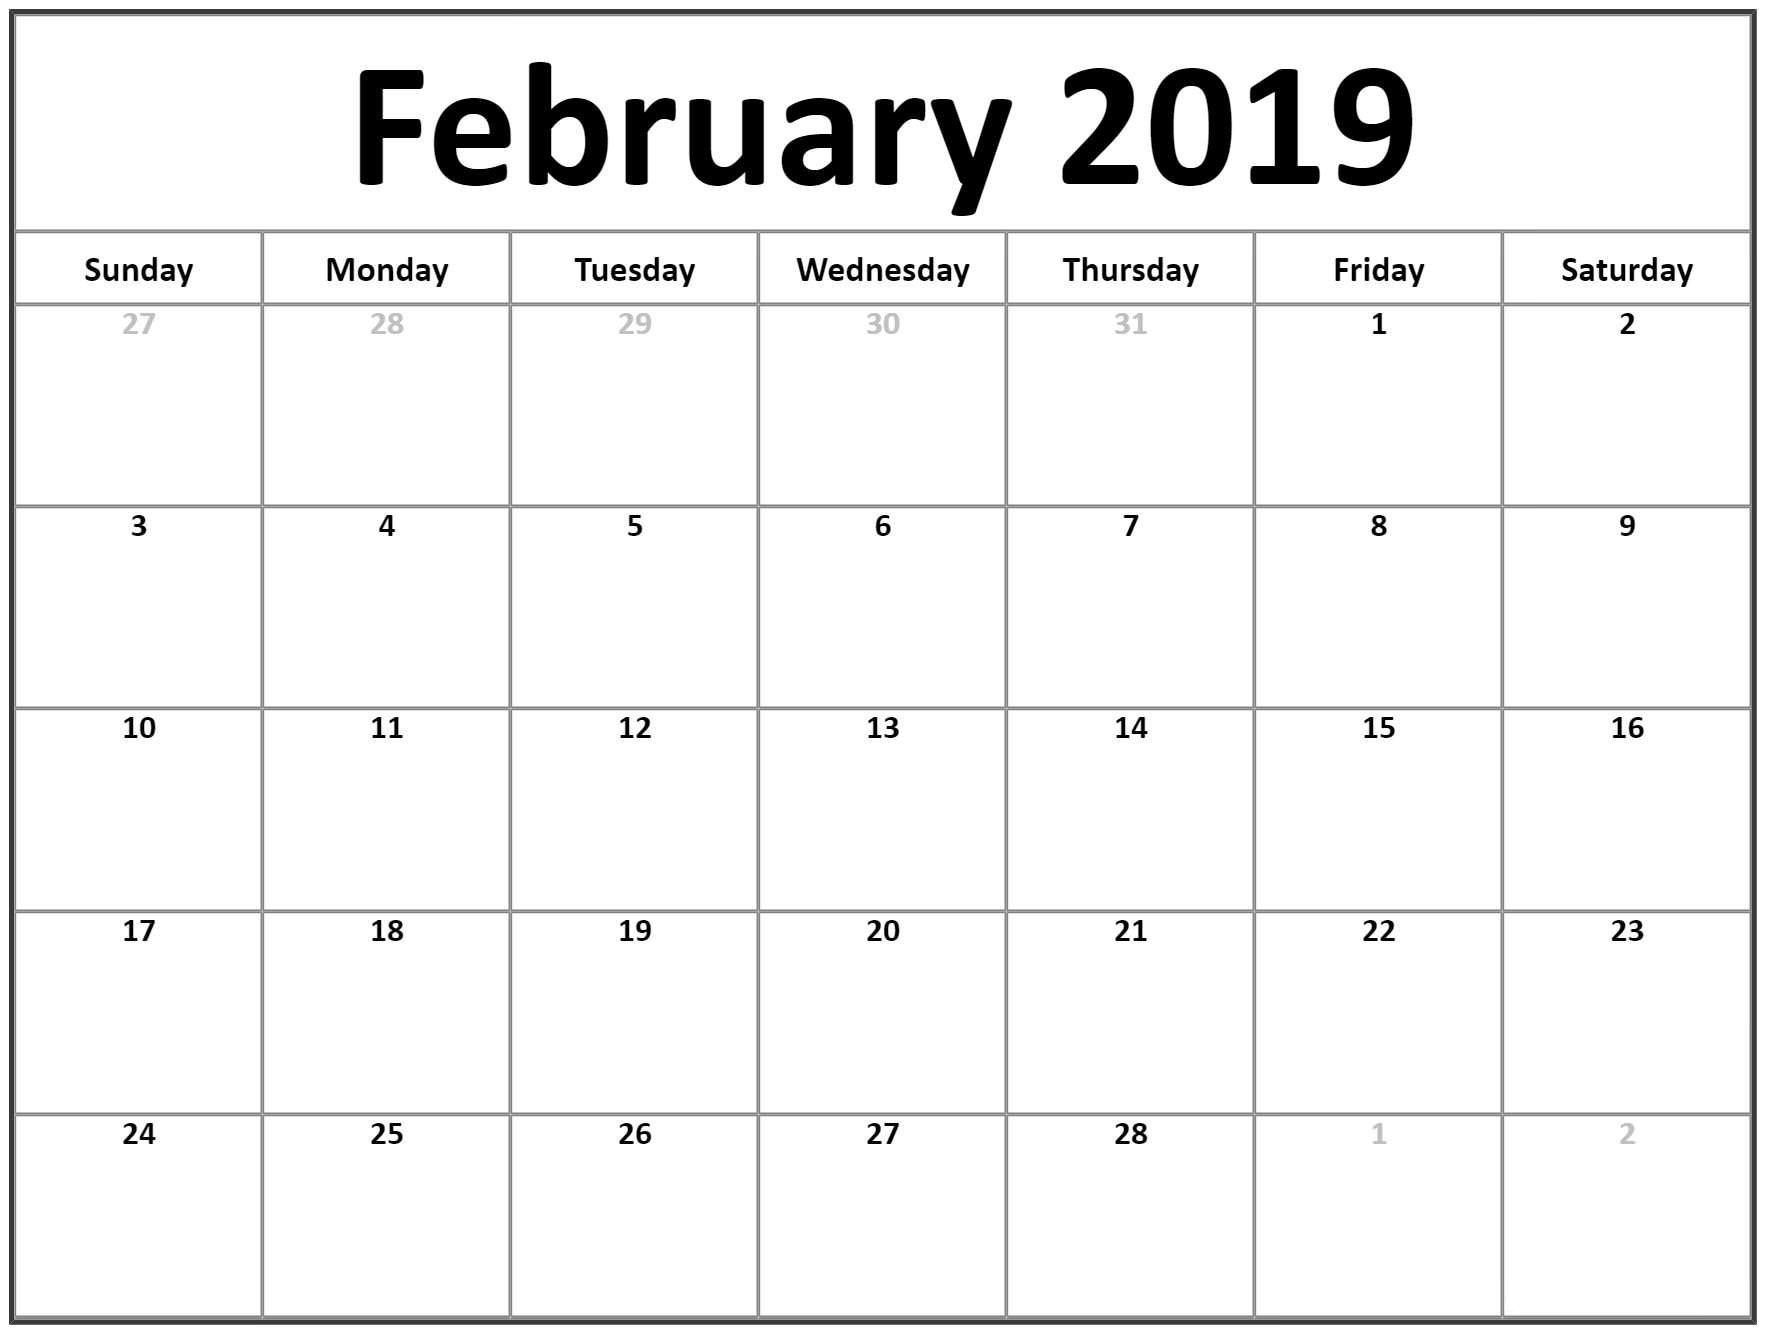 February Calendar 2019 For Office | February Calendar 2019-Fillable January 2020 Calendar